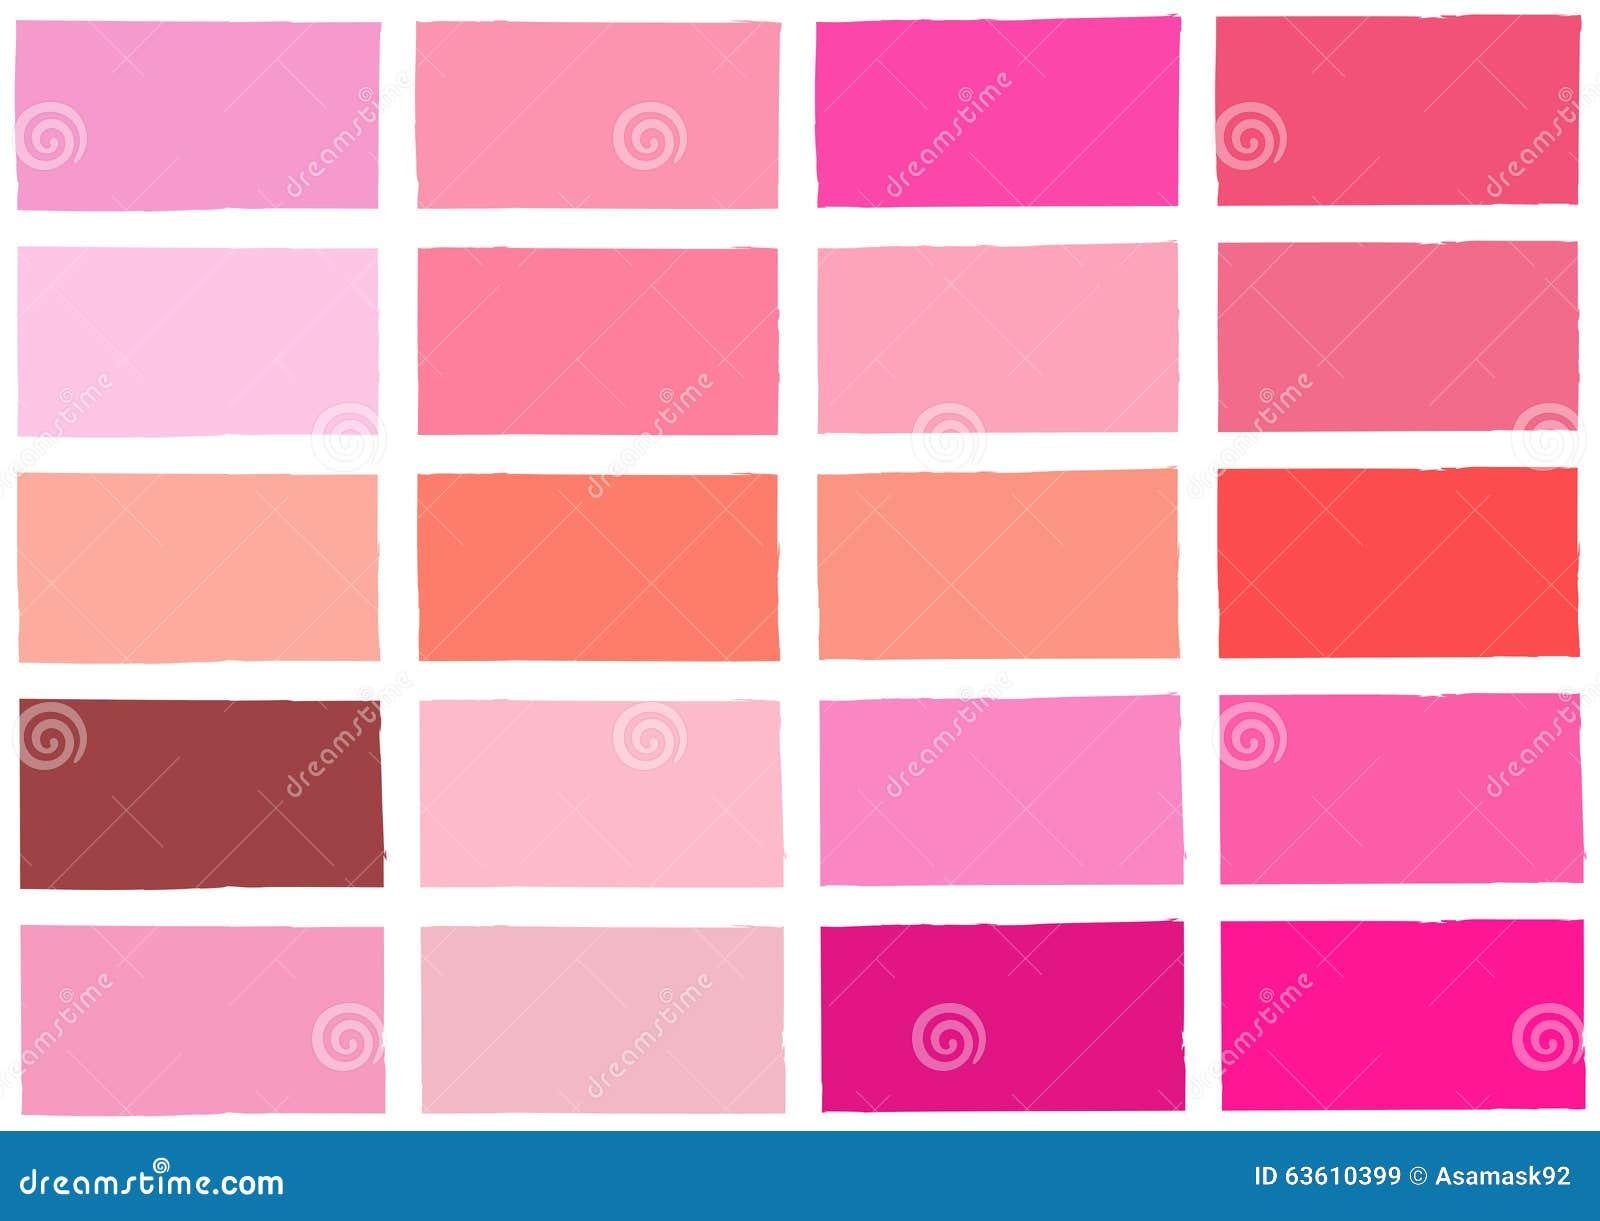 pink tone color shade background stock vector image. Black Bedroom Furniture Sets. Home Design Ideas